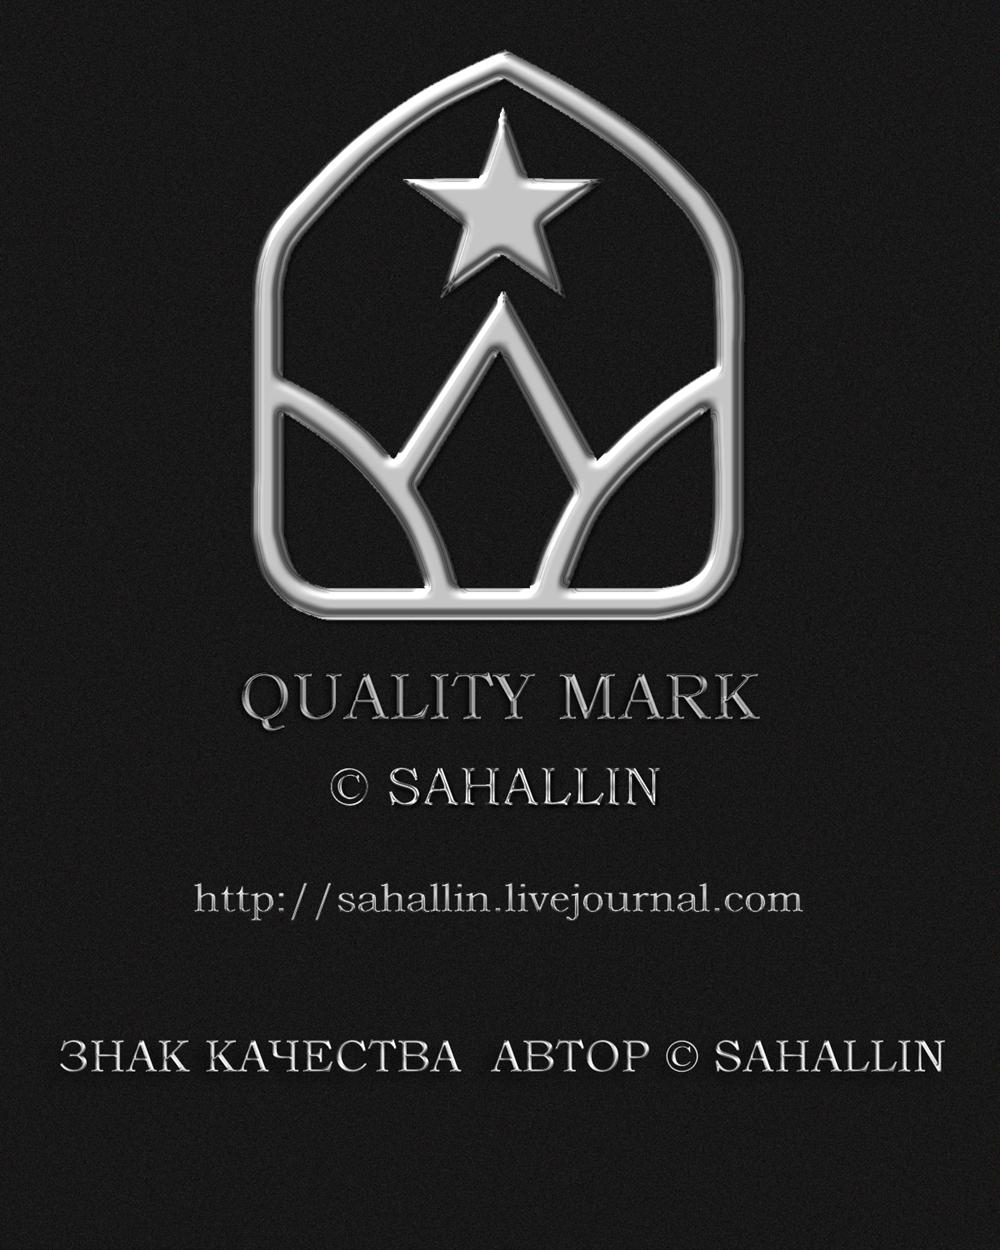 знак, качества, Россия, Сахалин, Quality, mark, Russia, Sakhalin, Sahallin